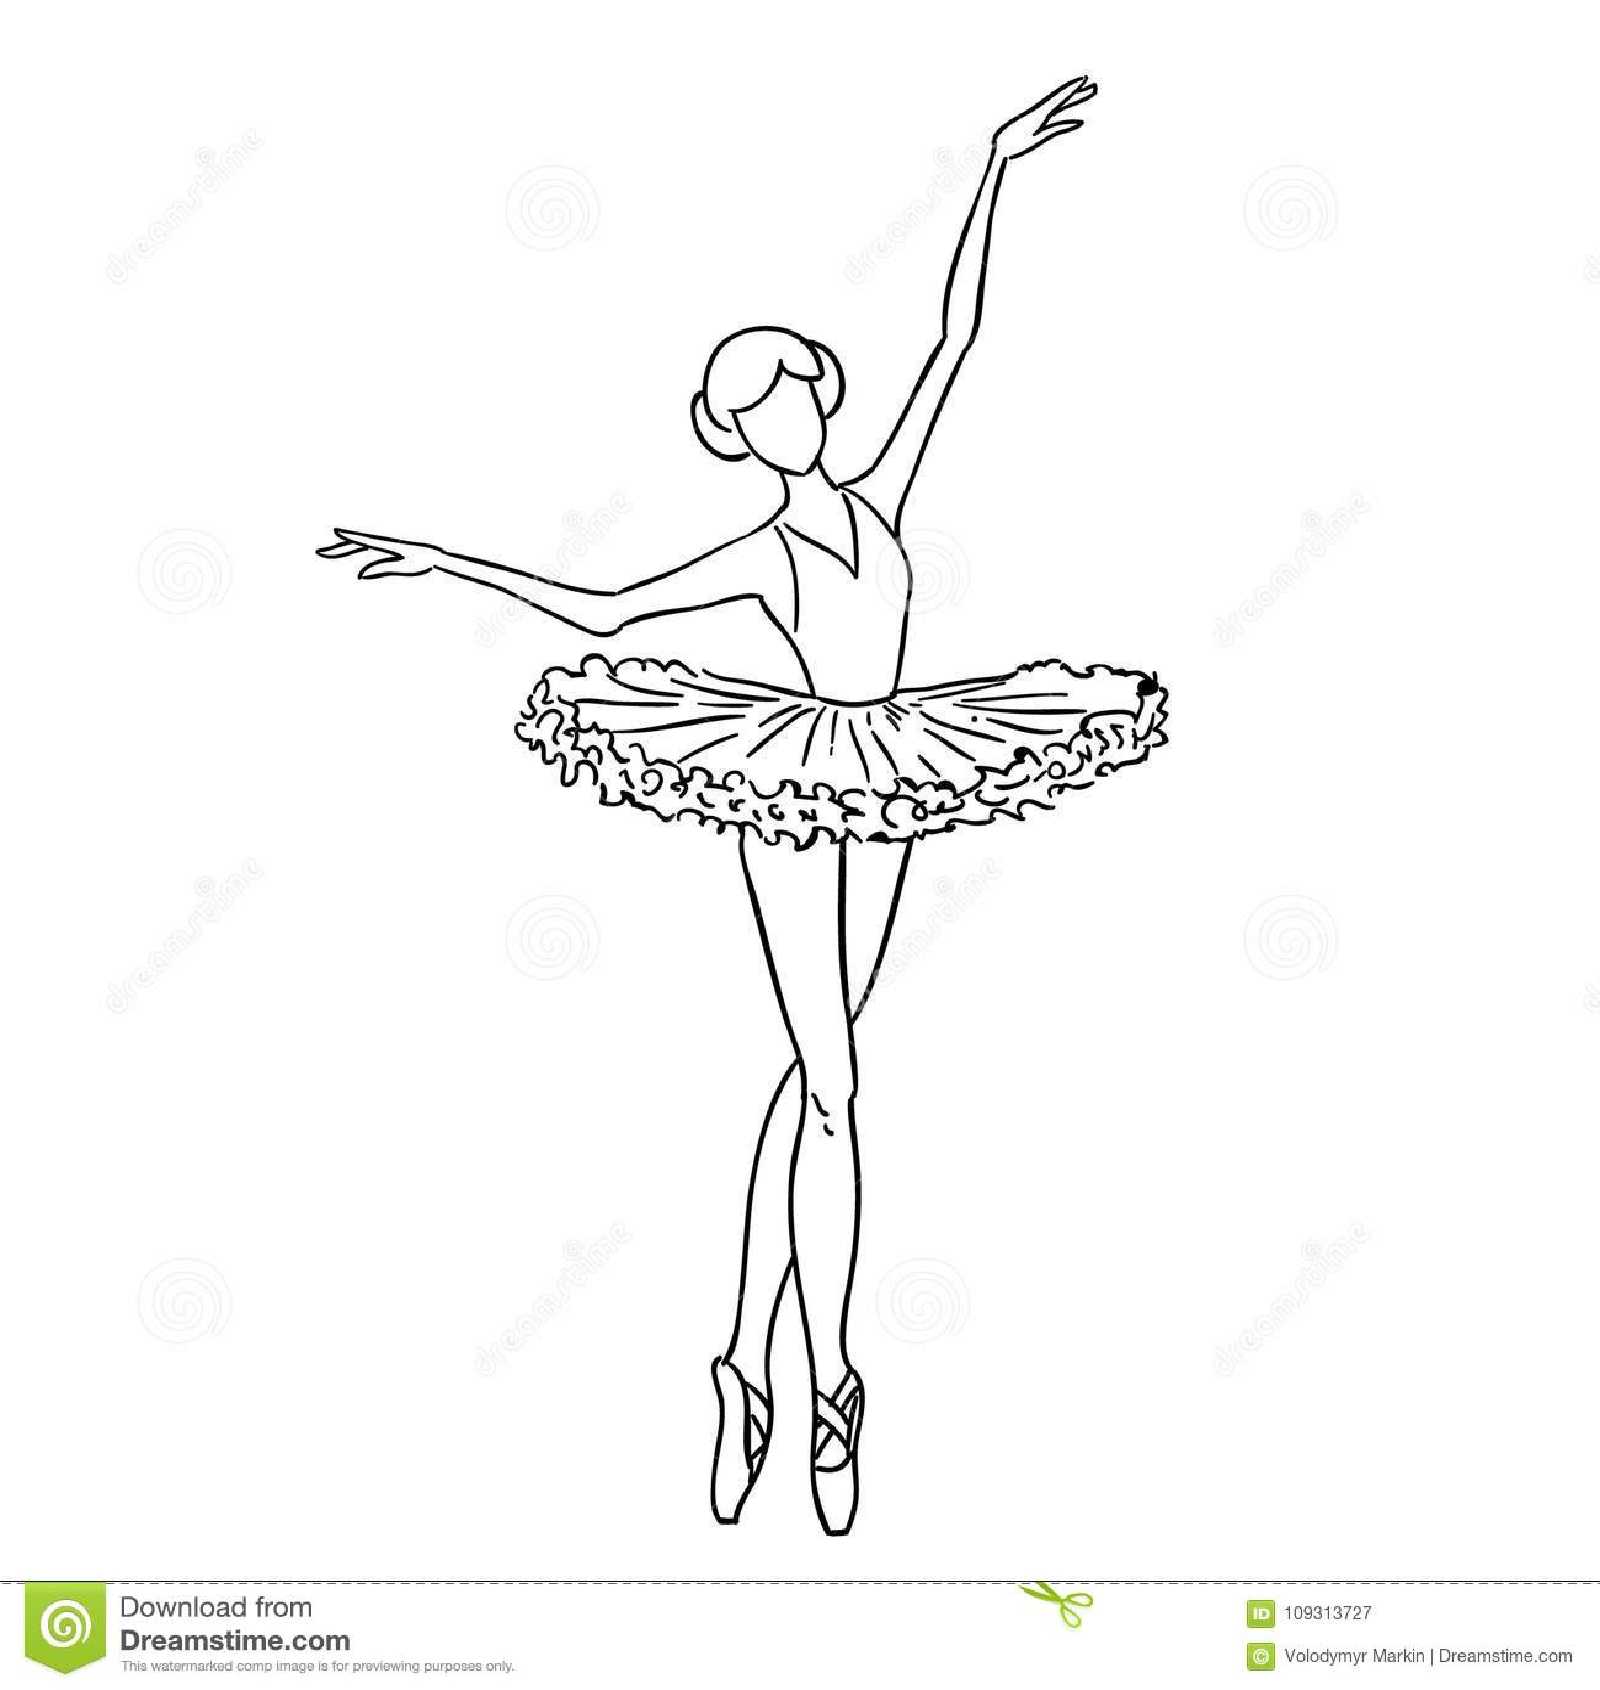 09ffa40a81a4 Illustration Of A Sketch Contour Drawing Of A Girl Ballerina Dancer ...